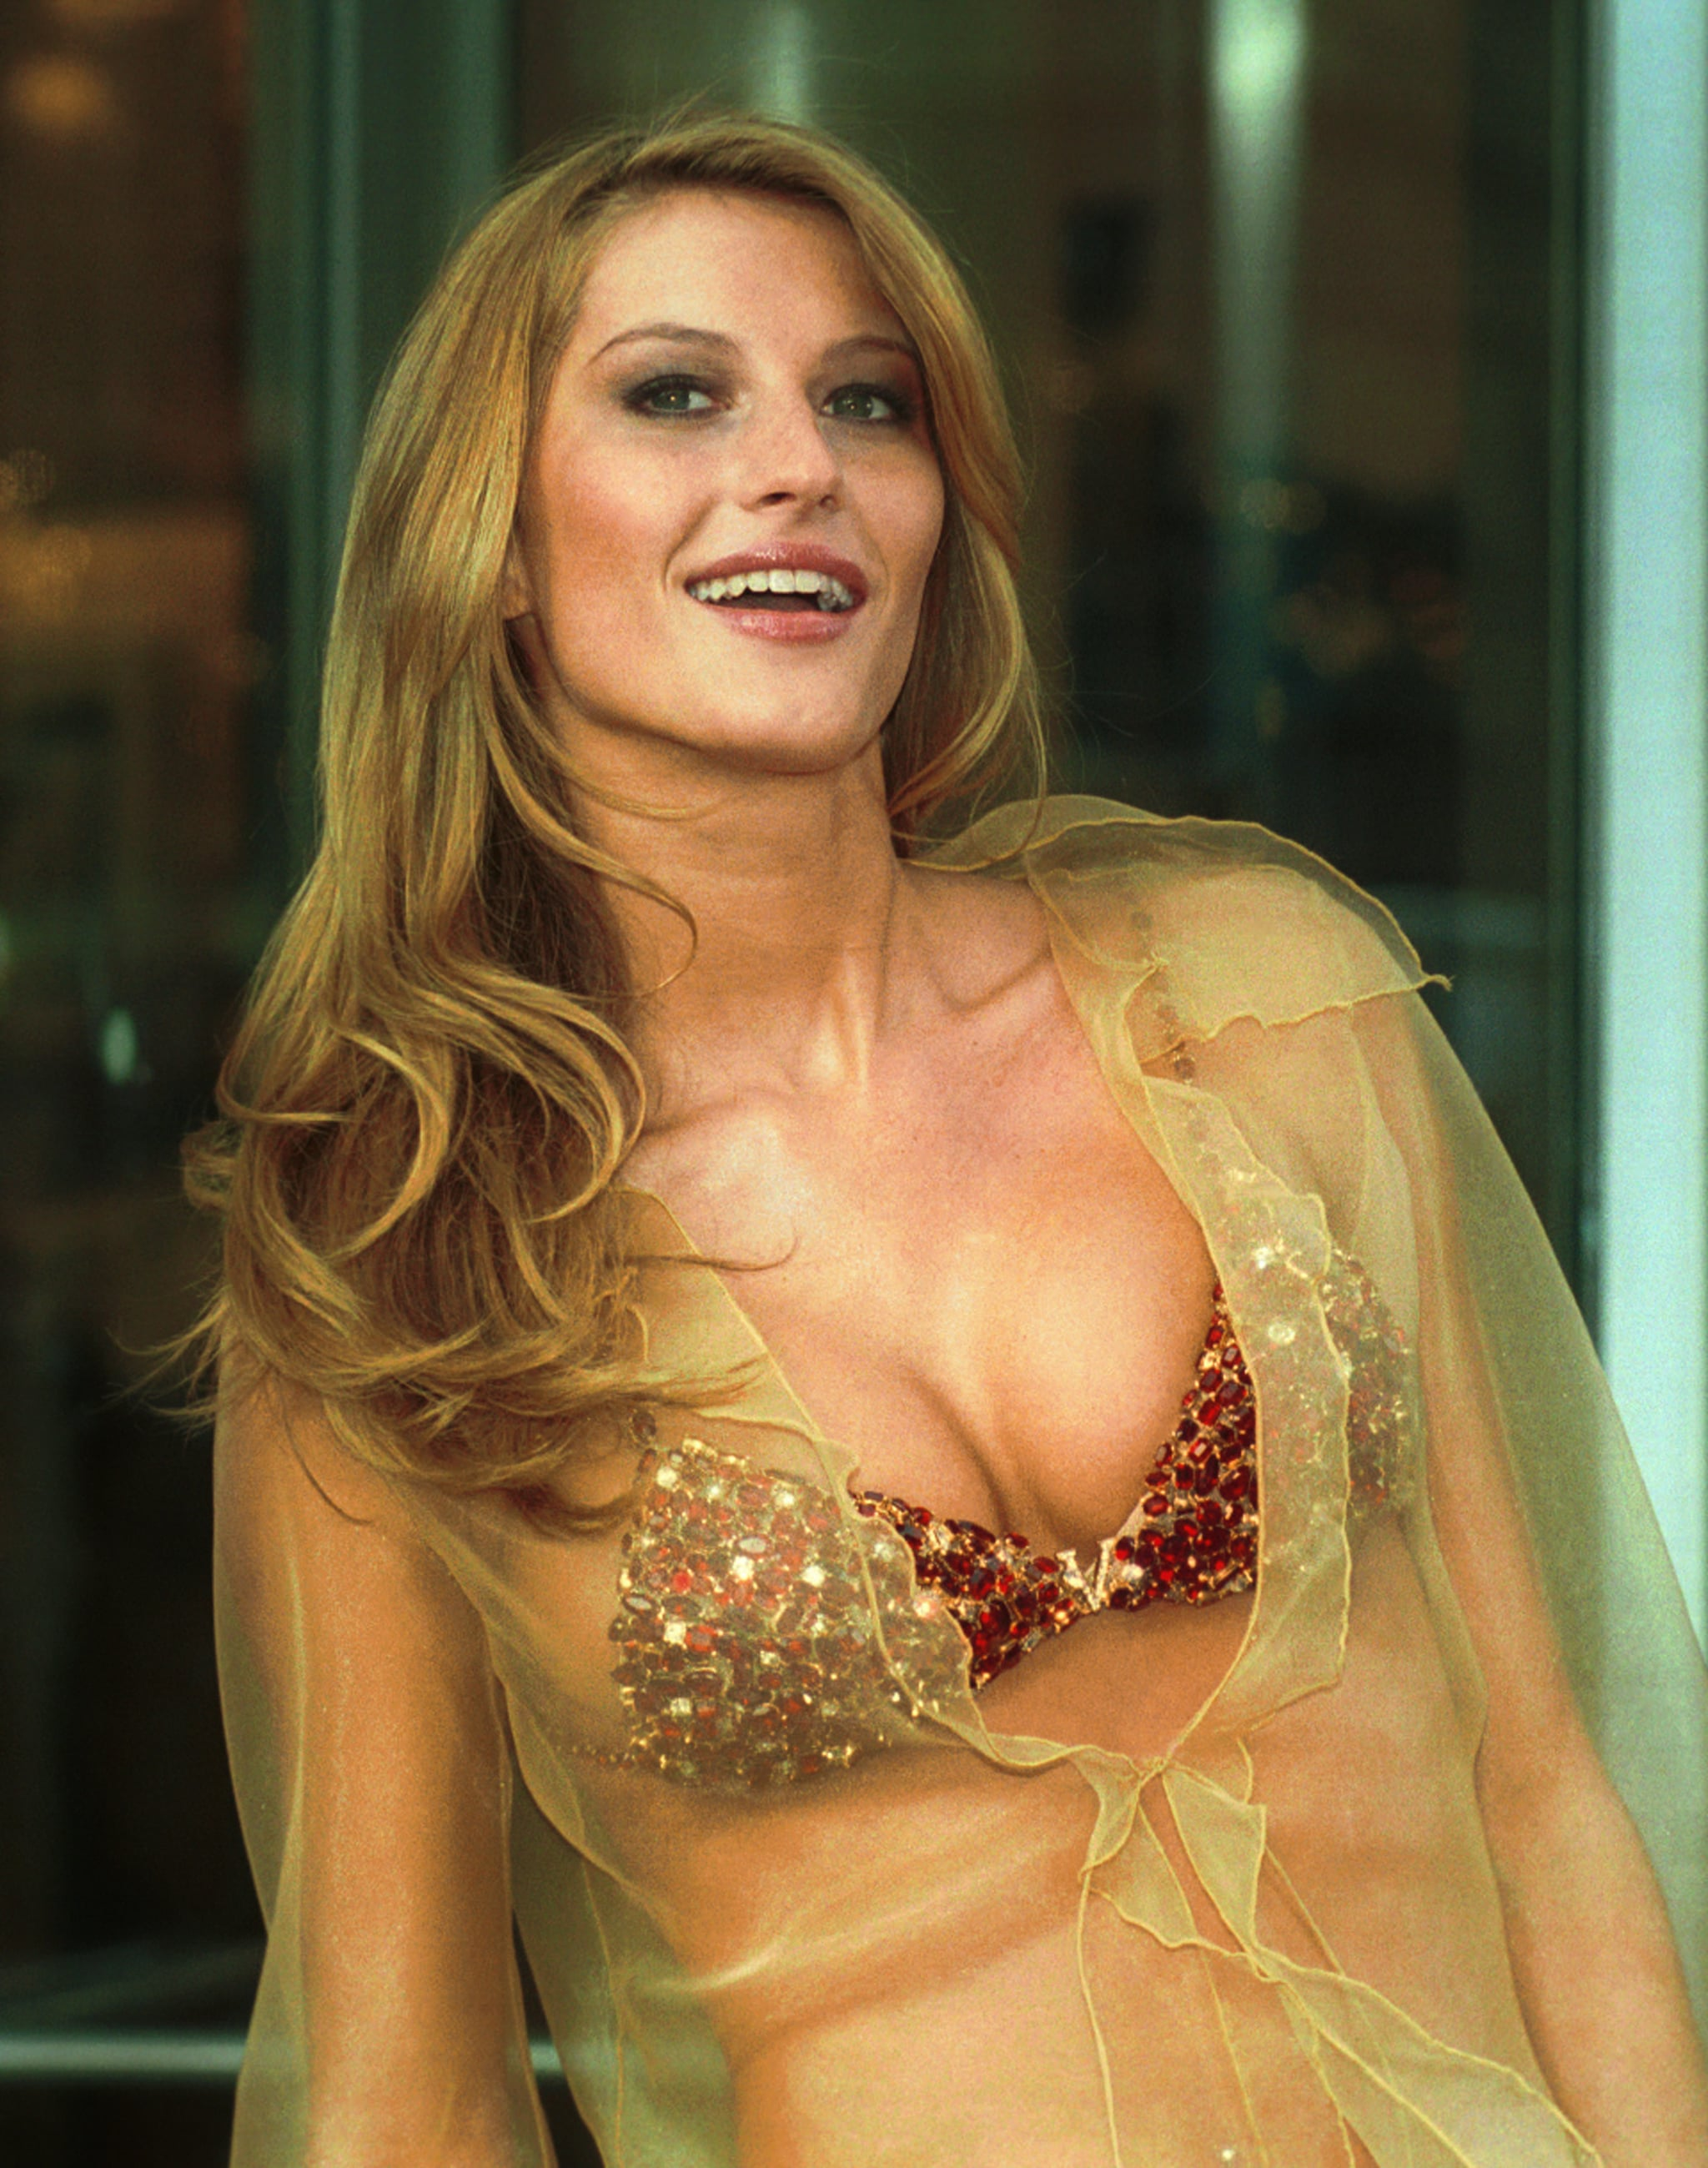 Year 2000 sexy lingeri